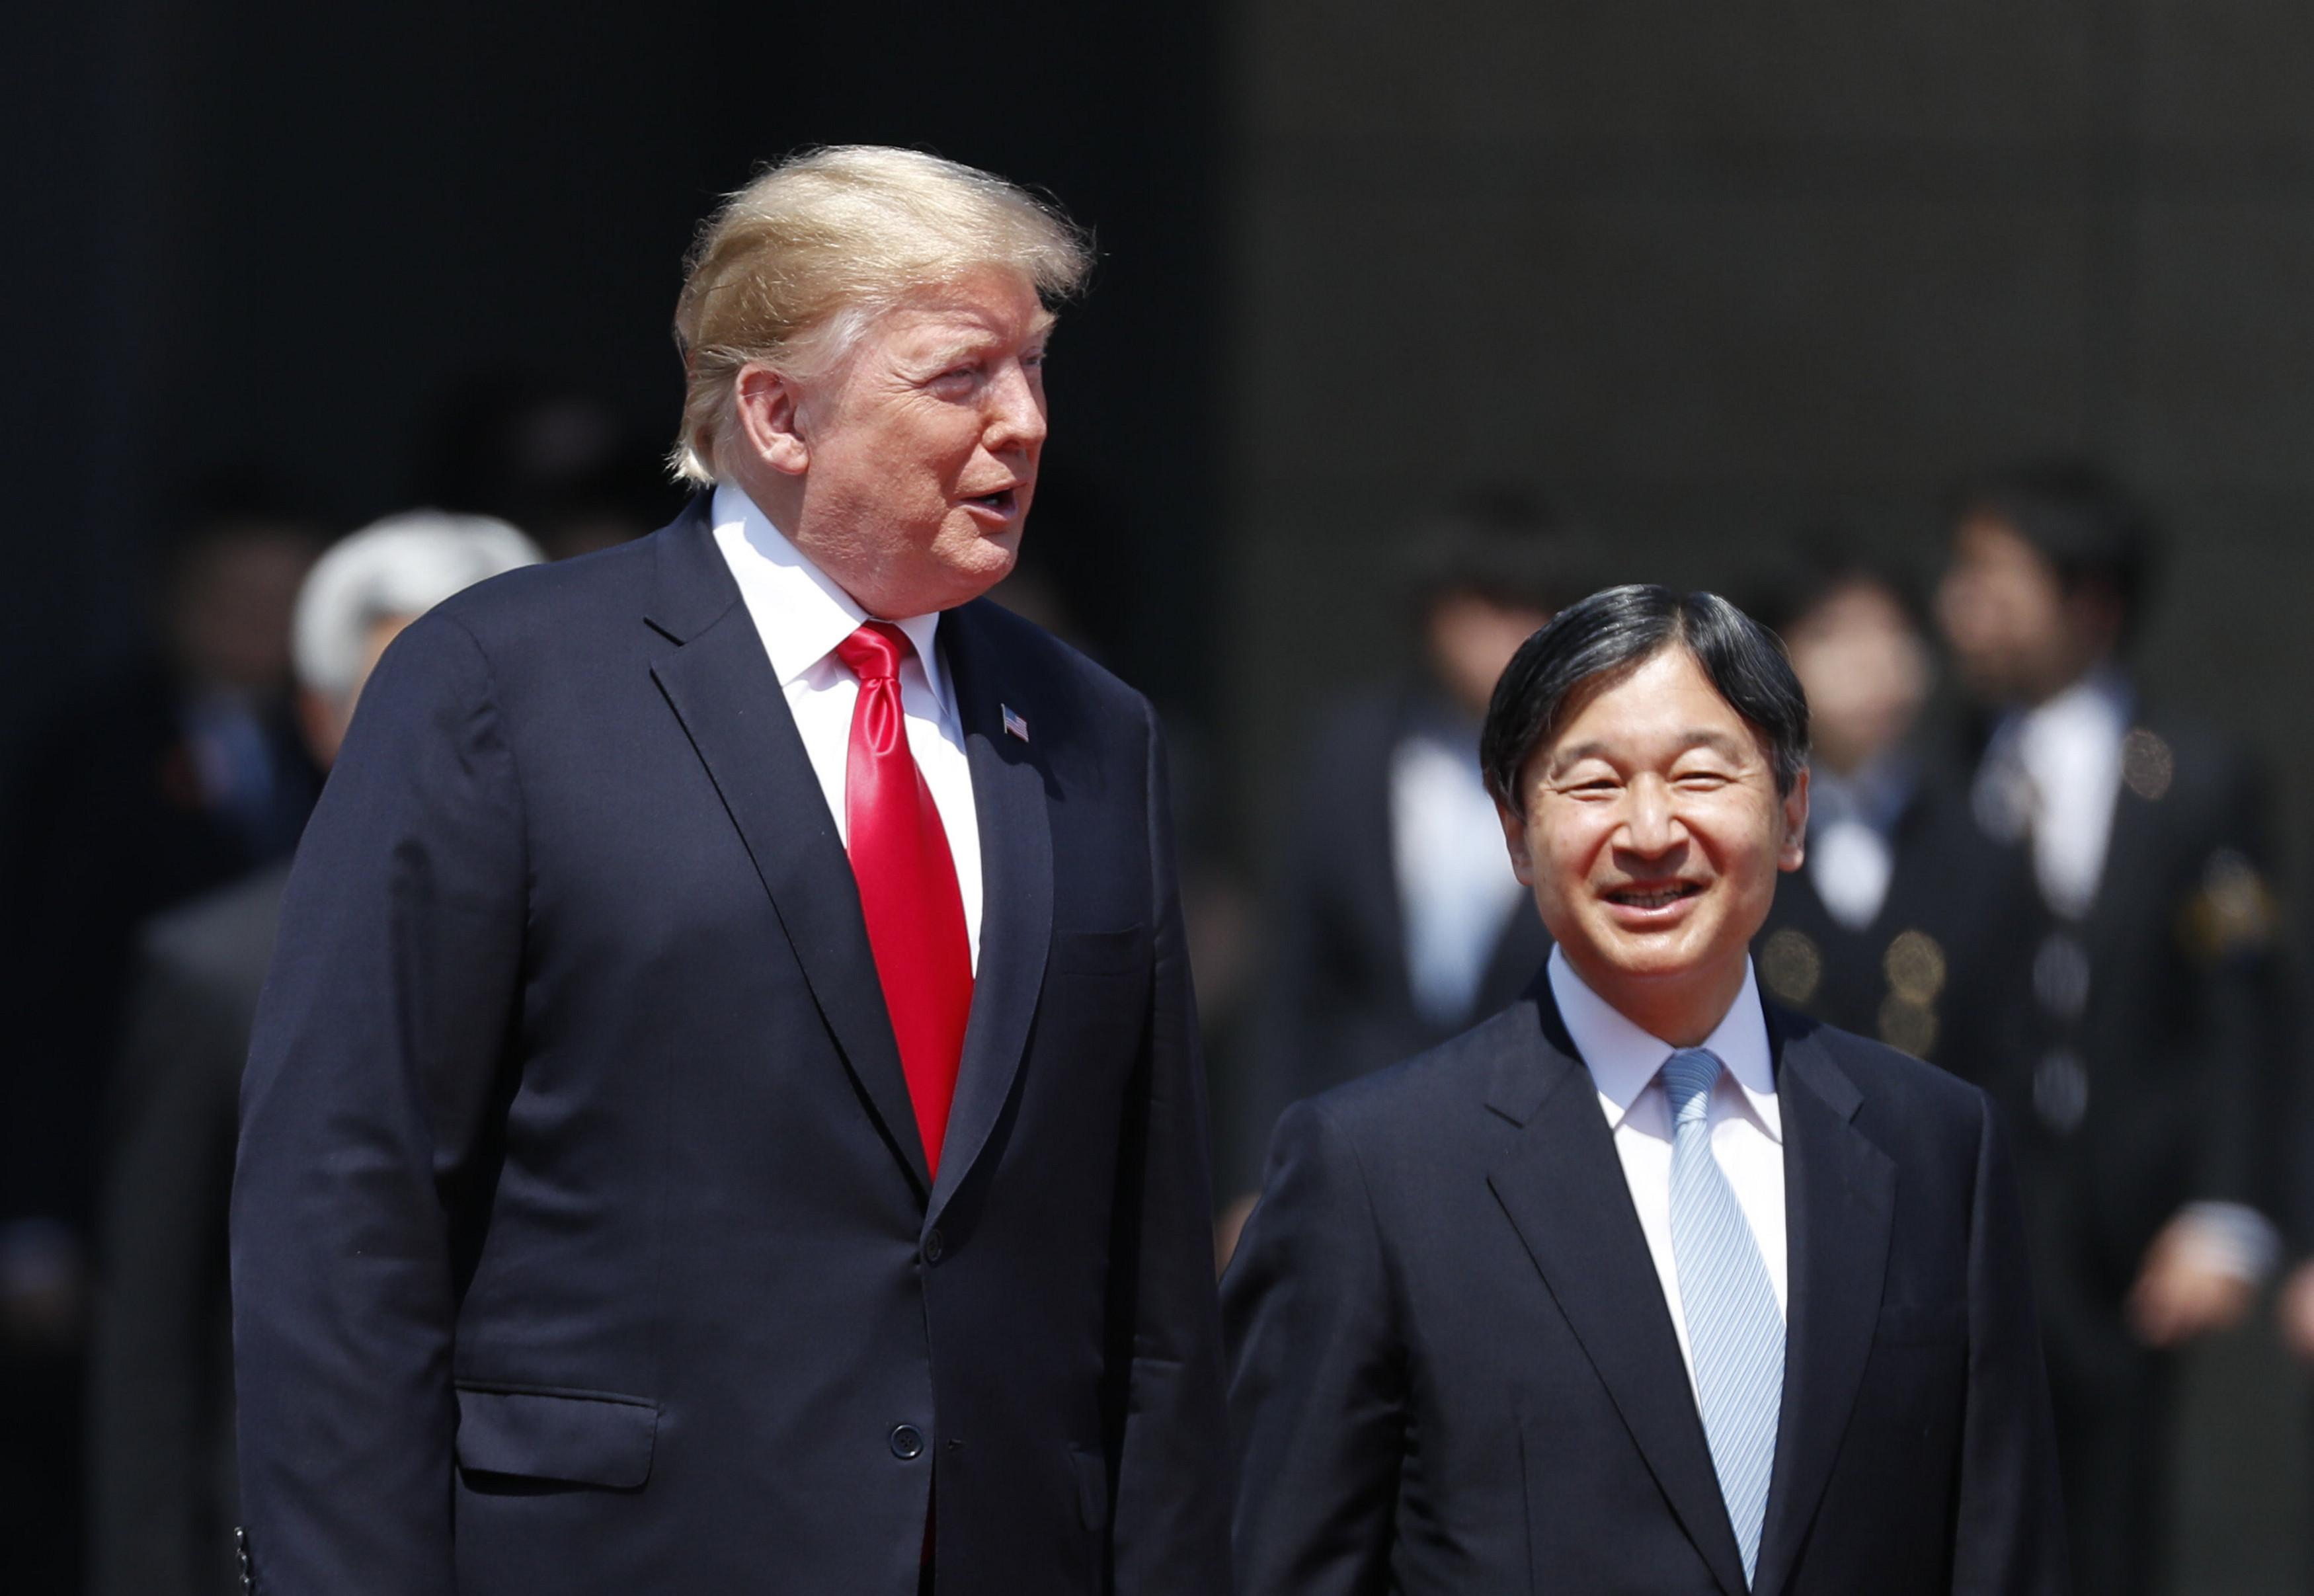 特朗普與德仁在歡迎儀式上交談。(Issei Kato – Pool/Getty Images)